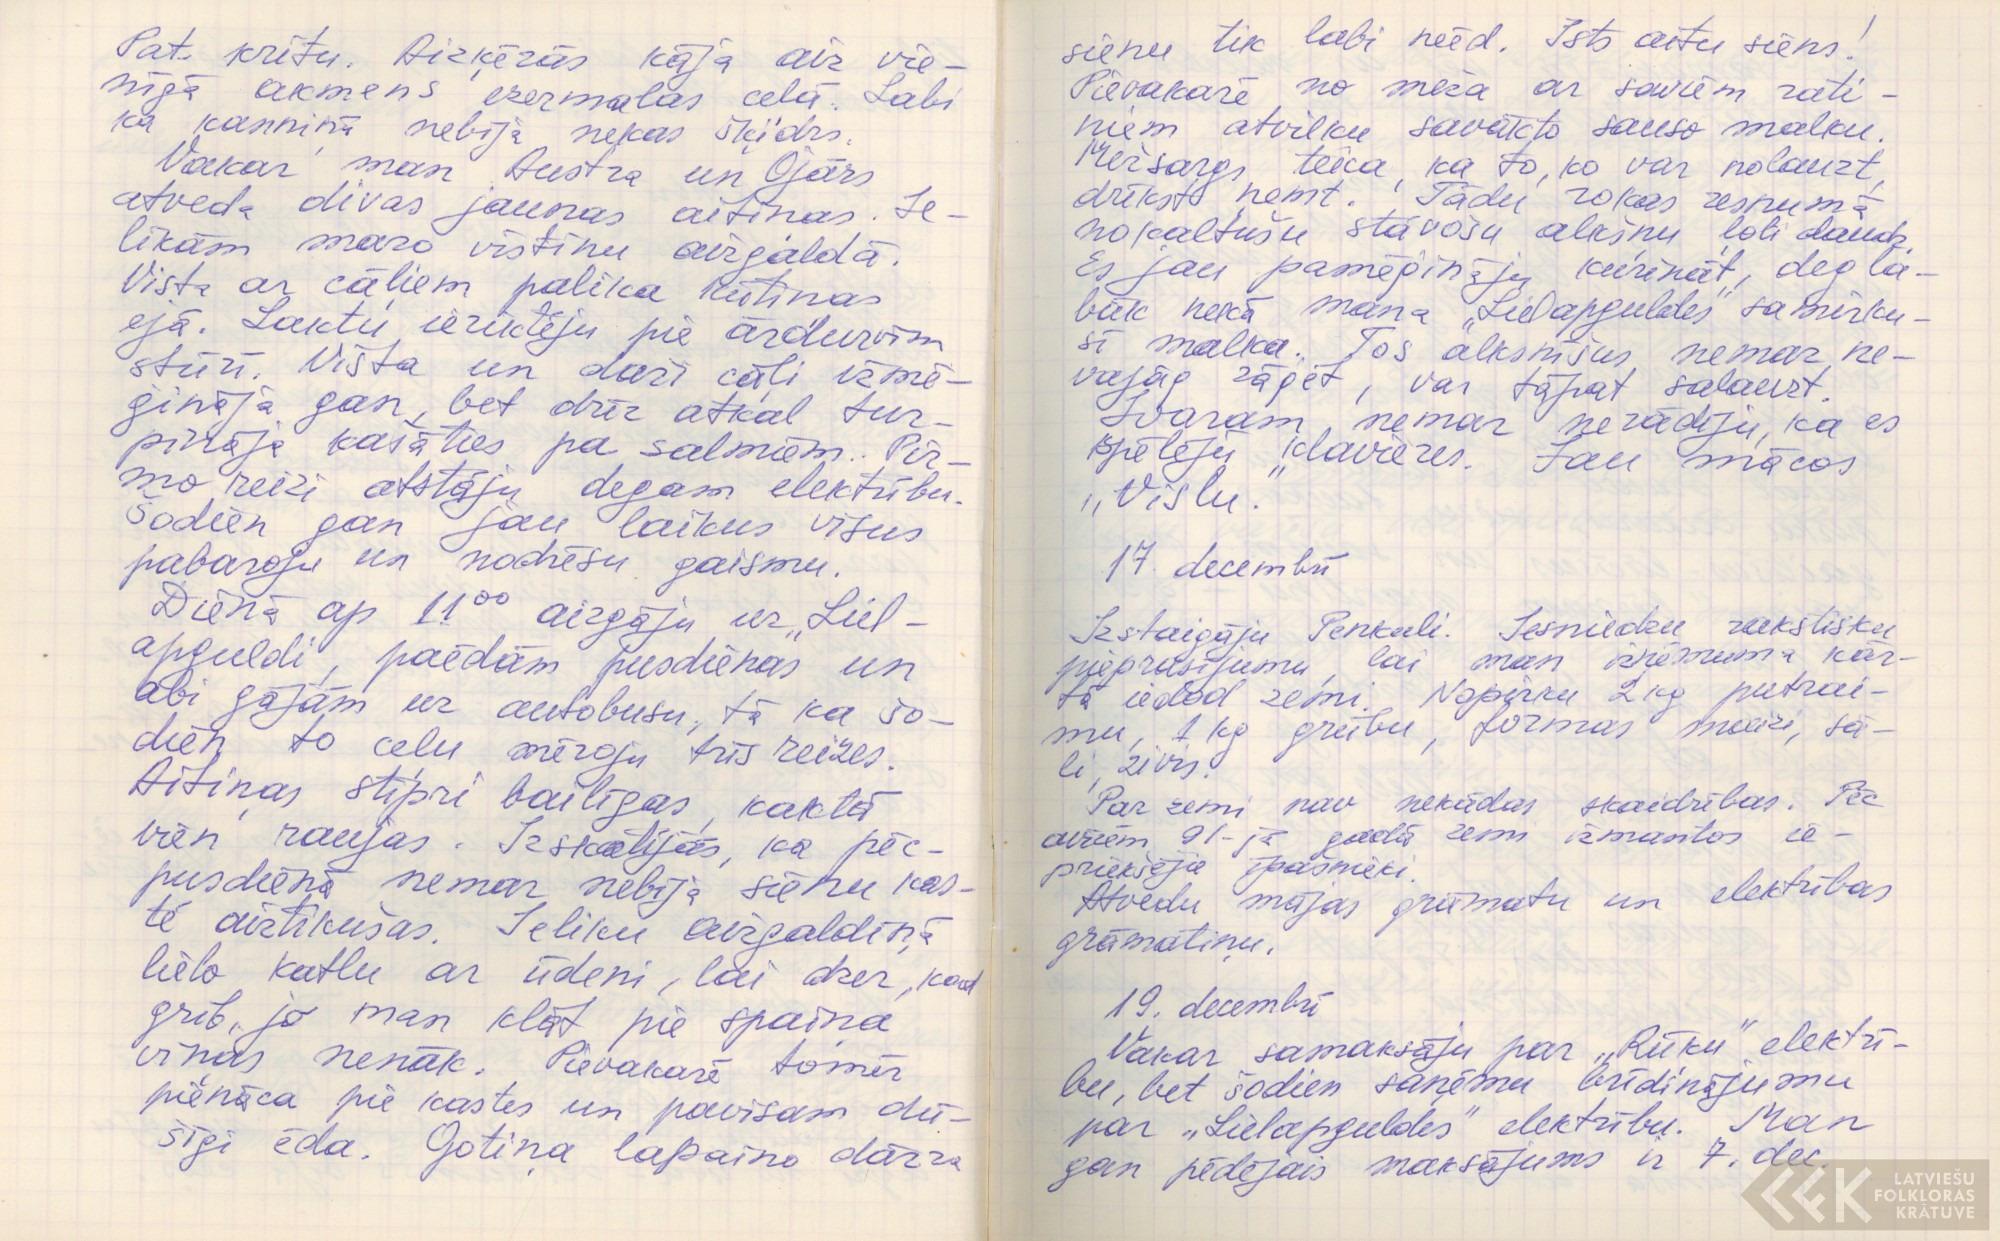 Ak161-Ligitas-Vucenas-dienasgramatas-28-0030